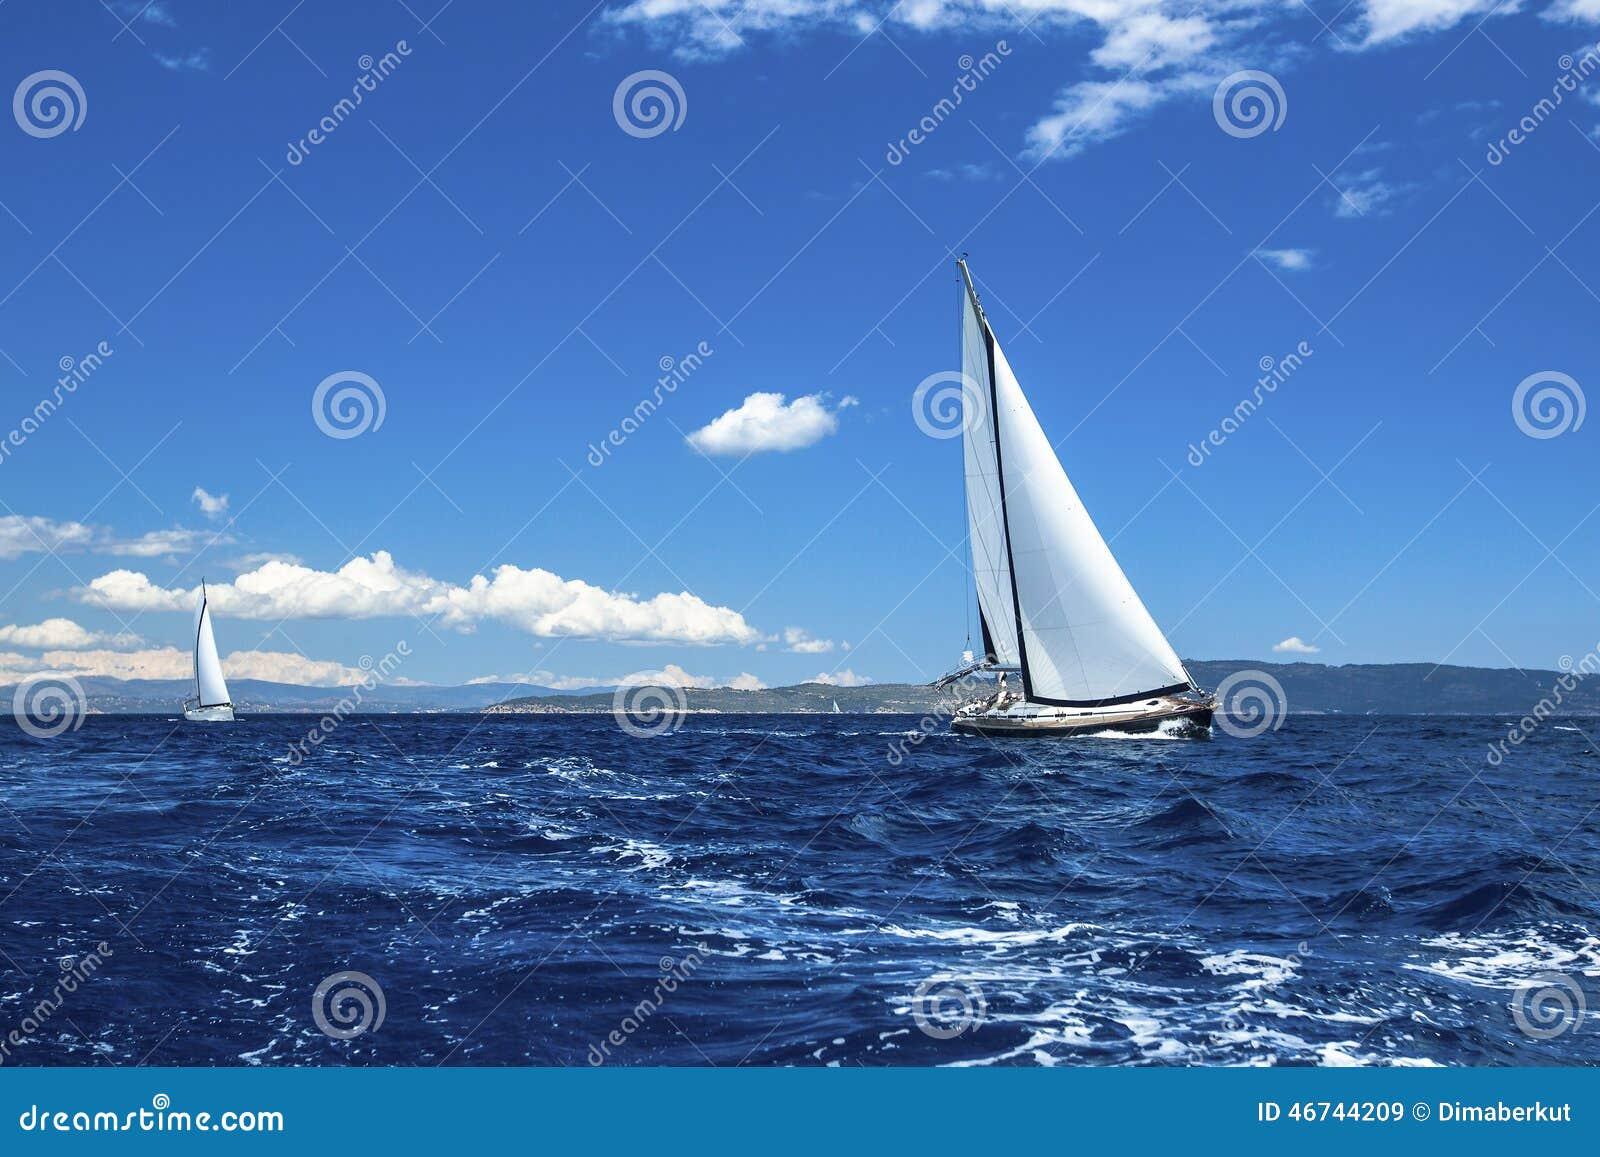 Sailing regatta. Luxury yachts.